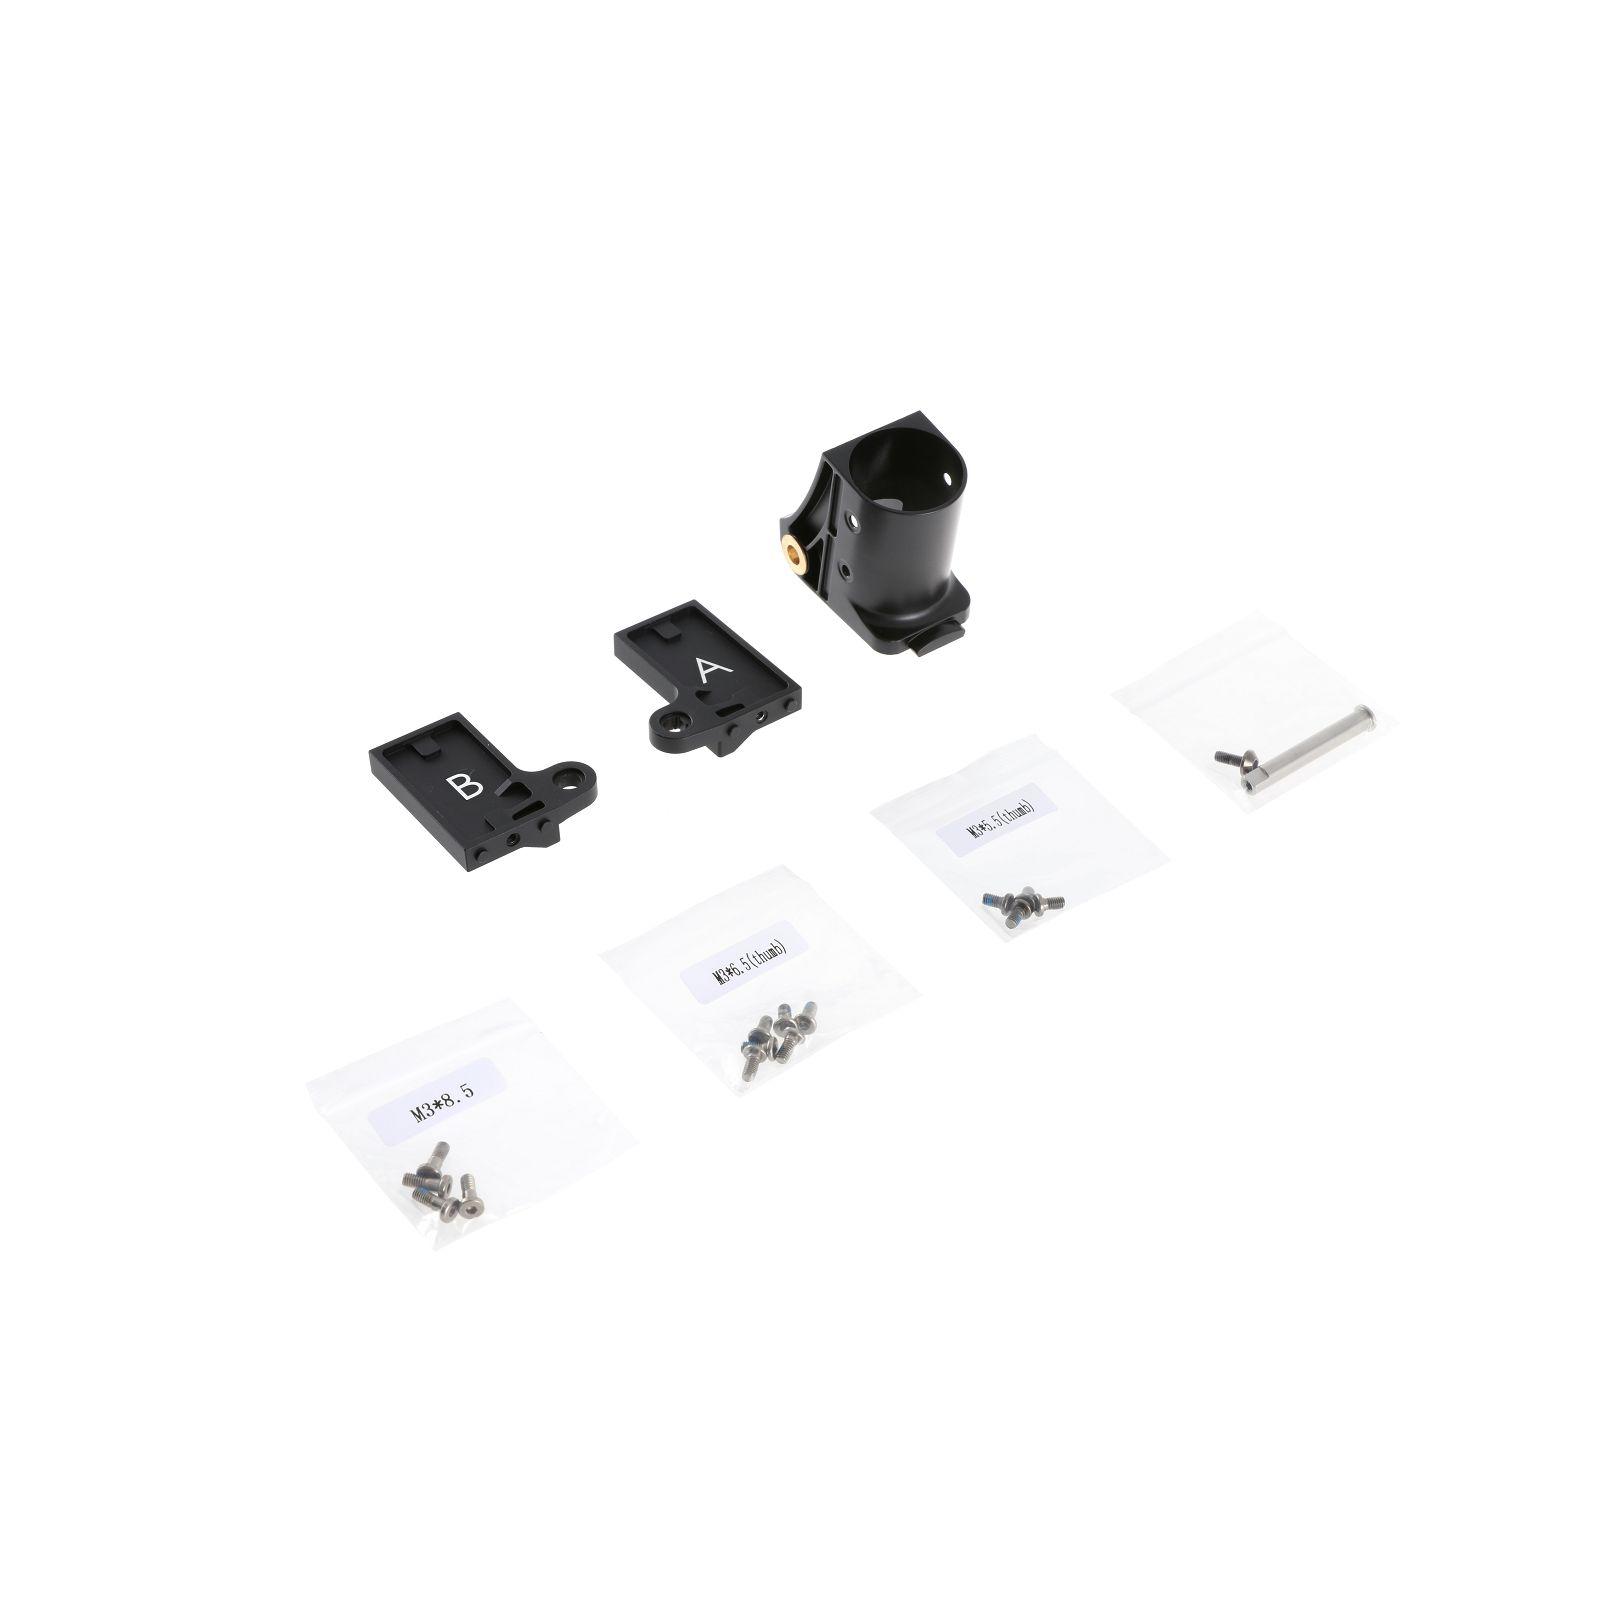 DJI Matrice 600 Spare Part 42 Aircraft Arm Collapsible Mount Kit